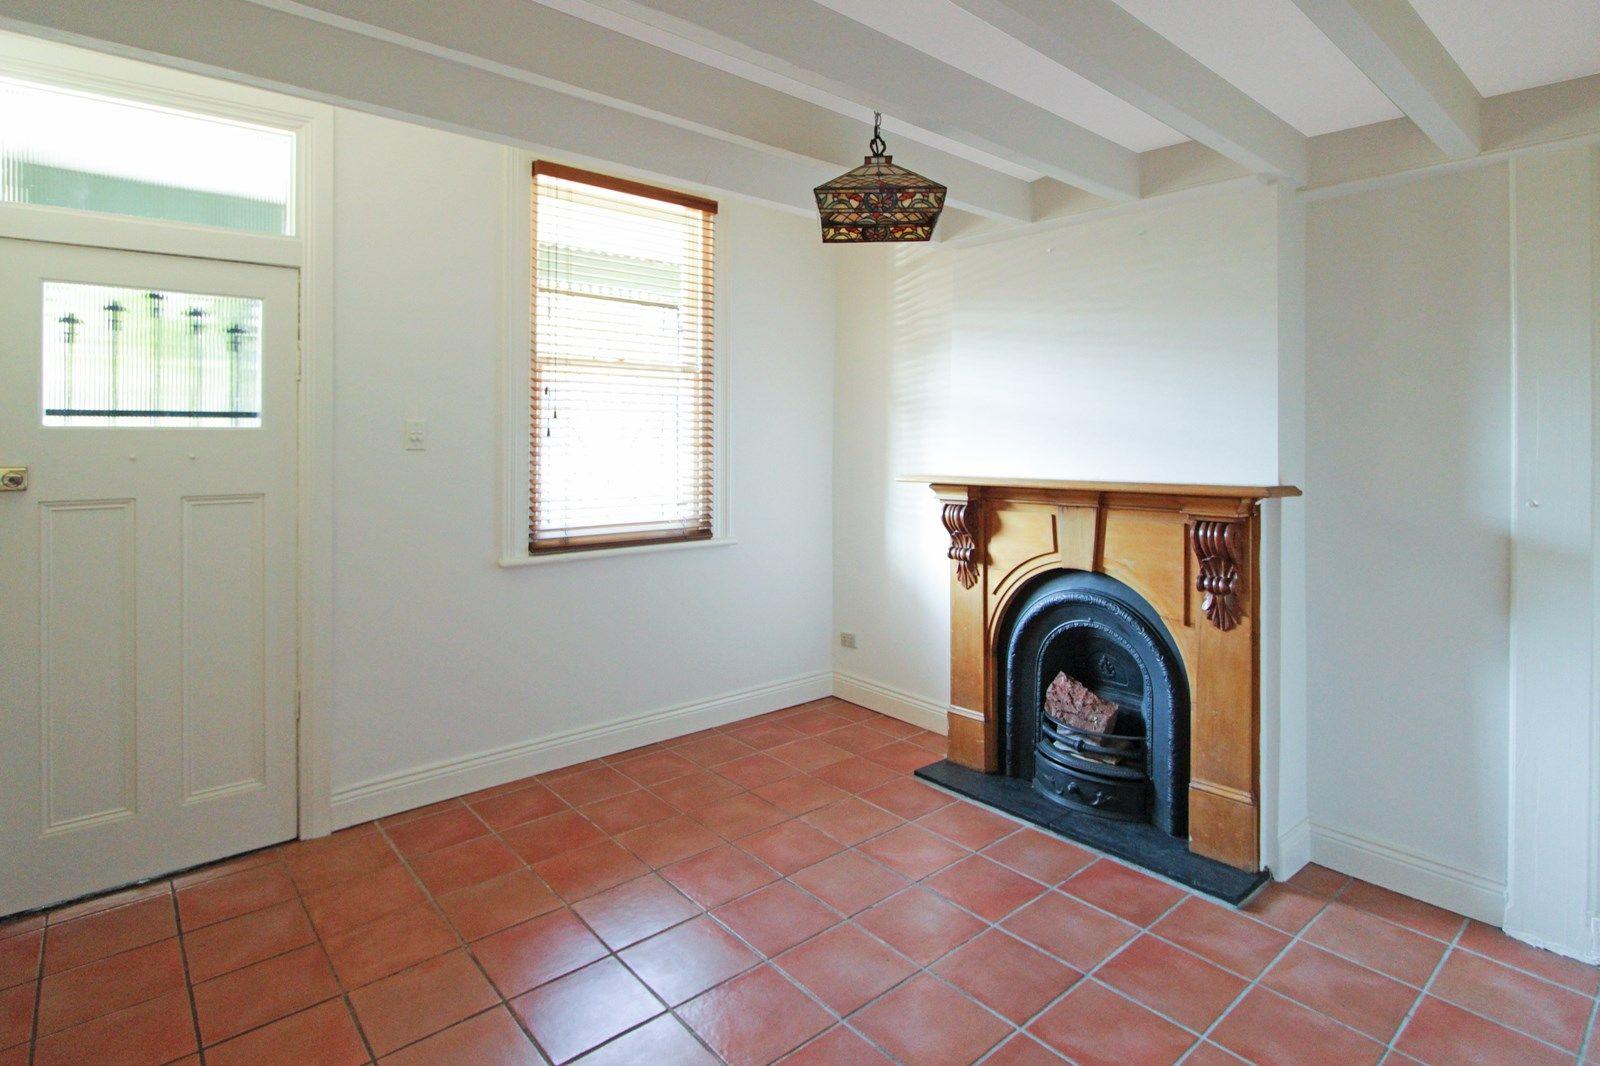 29 Raphael Street, Abbotsford VIC 3067, Image 1